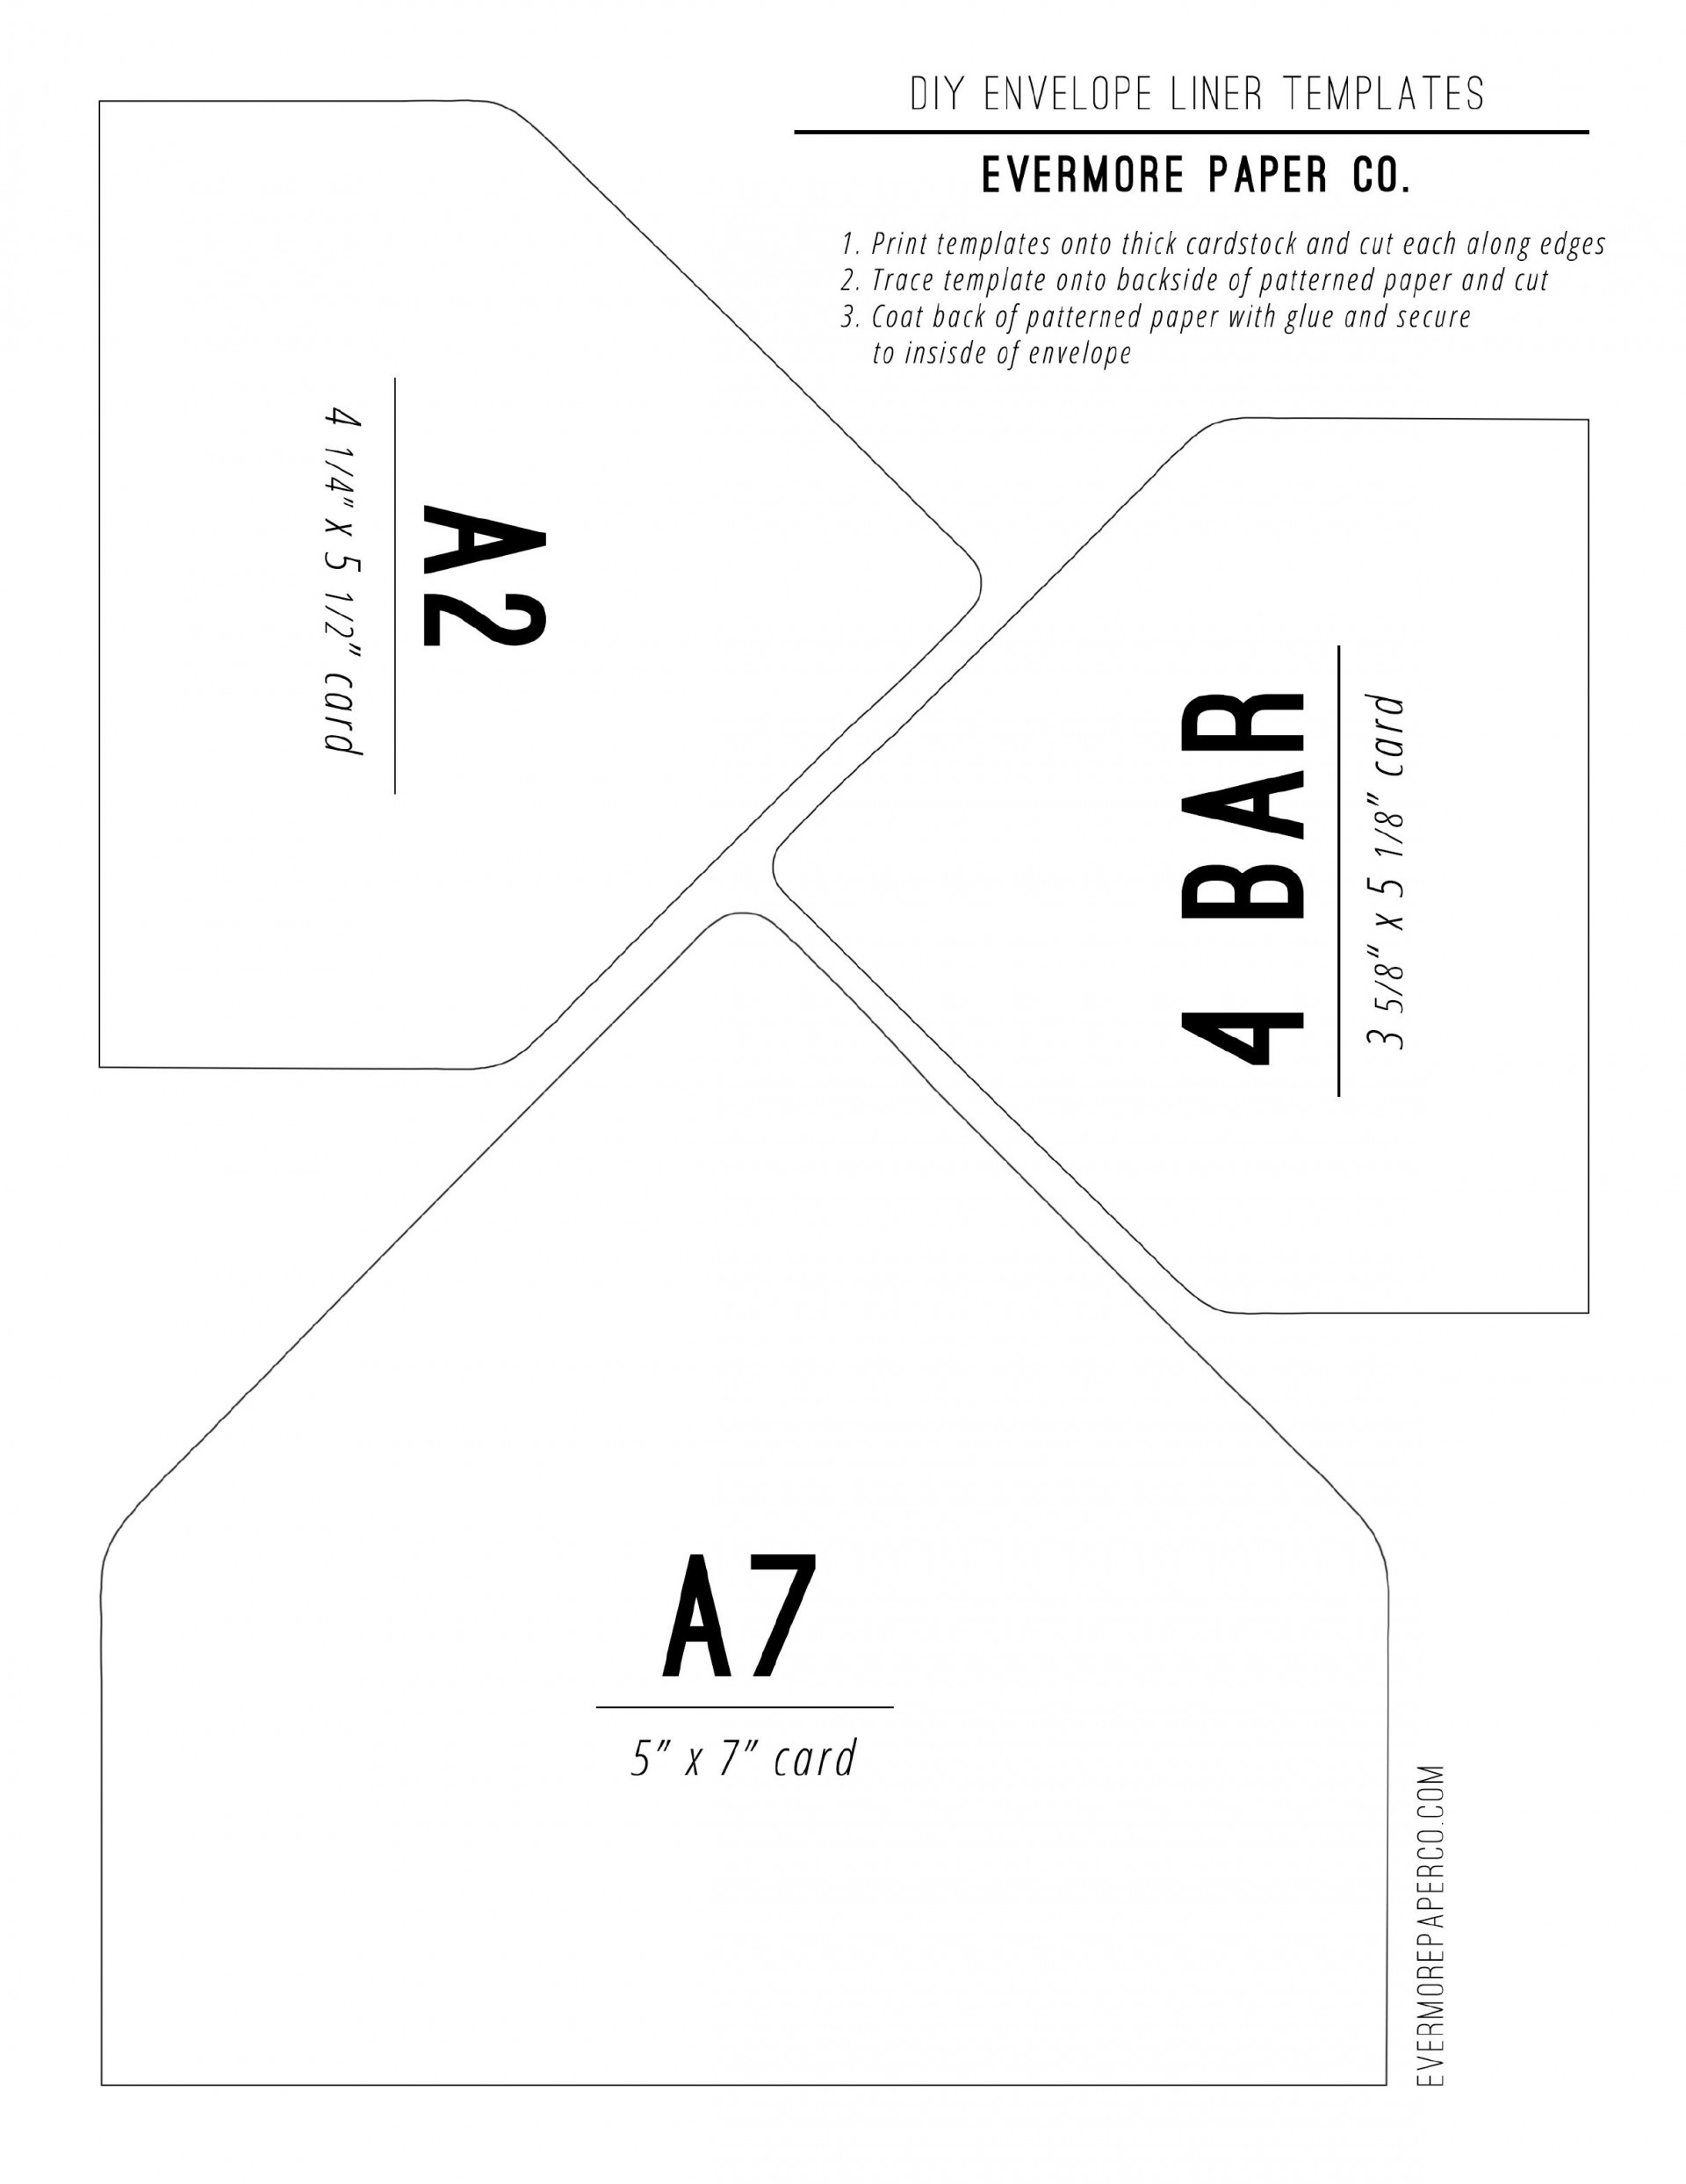 007 Astounding A7 Envelope Liner Template Image  Printable Illustrator Free1920